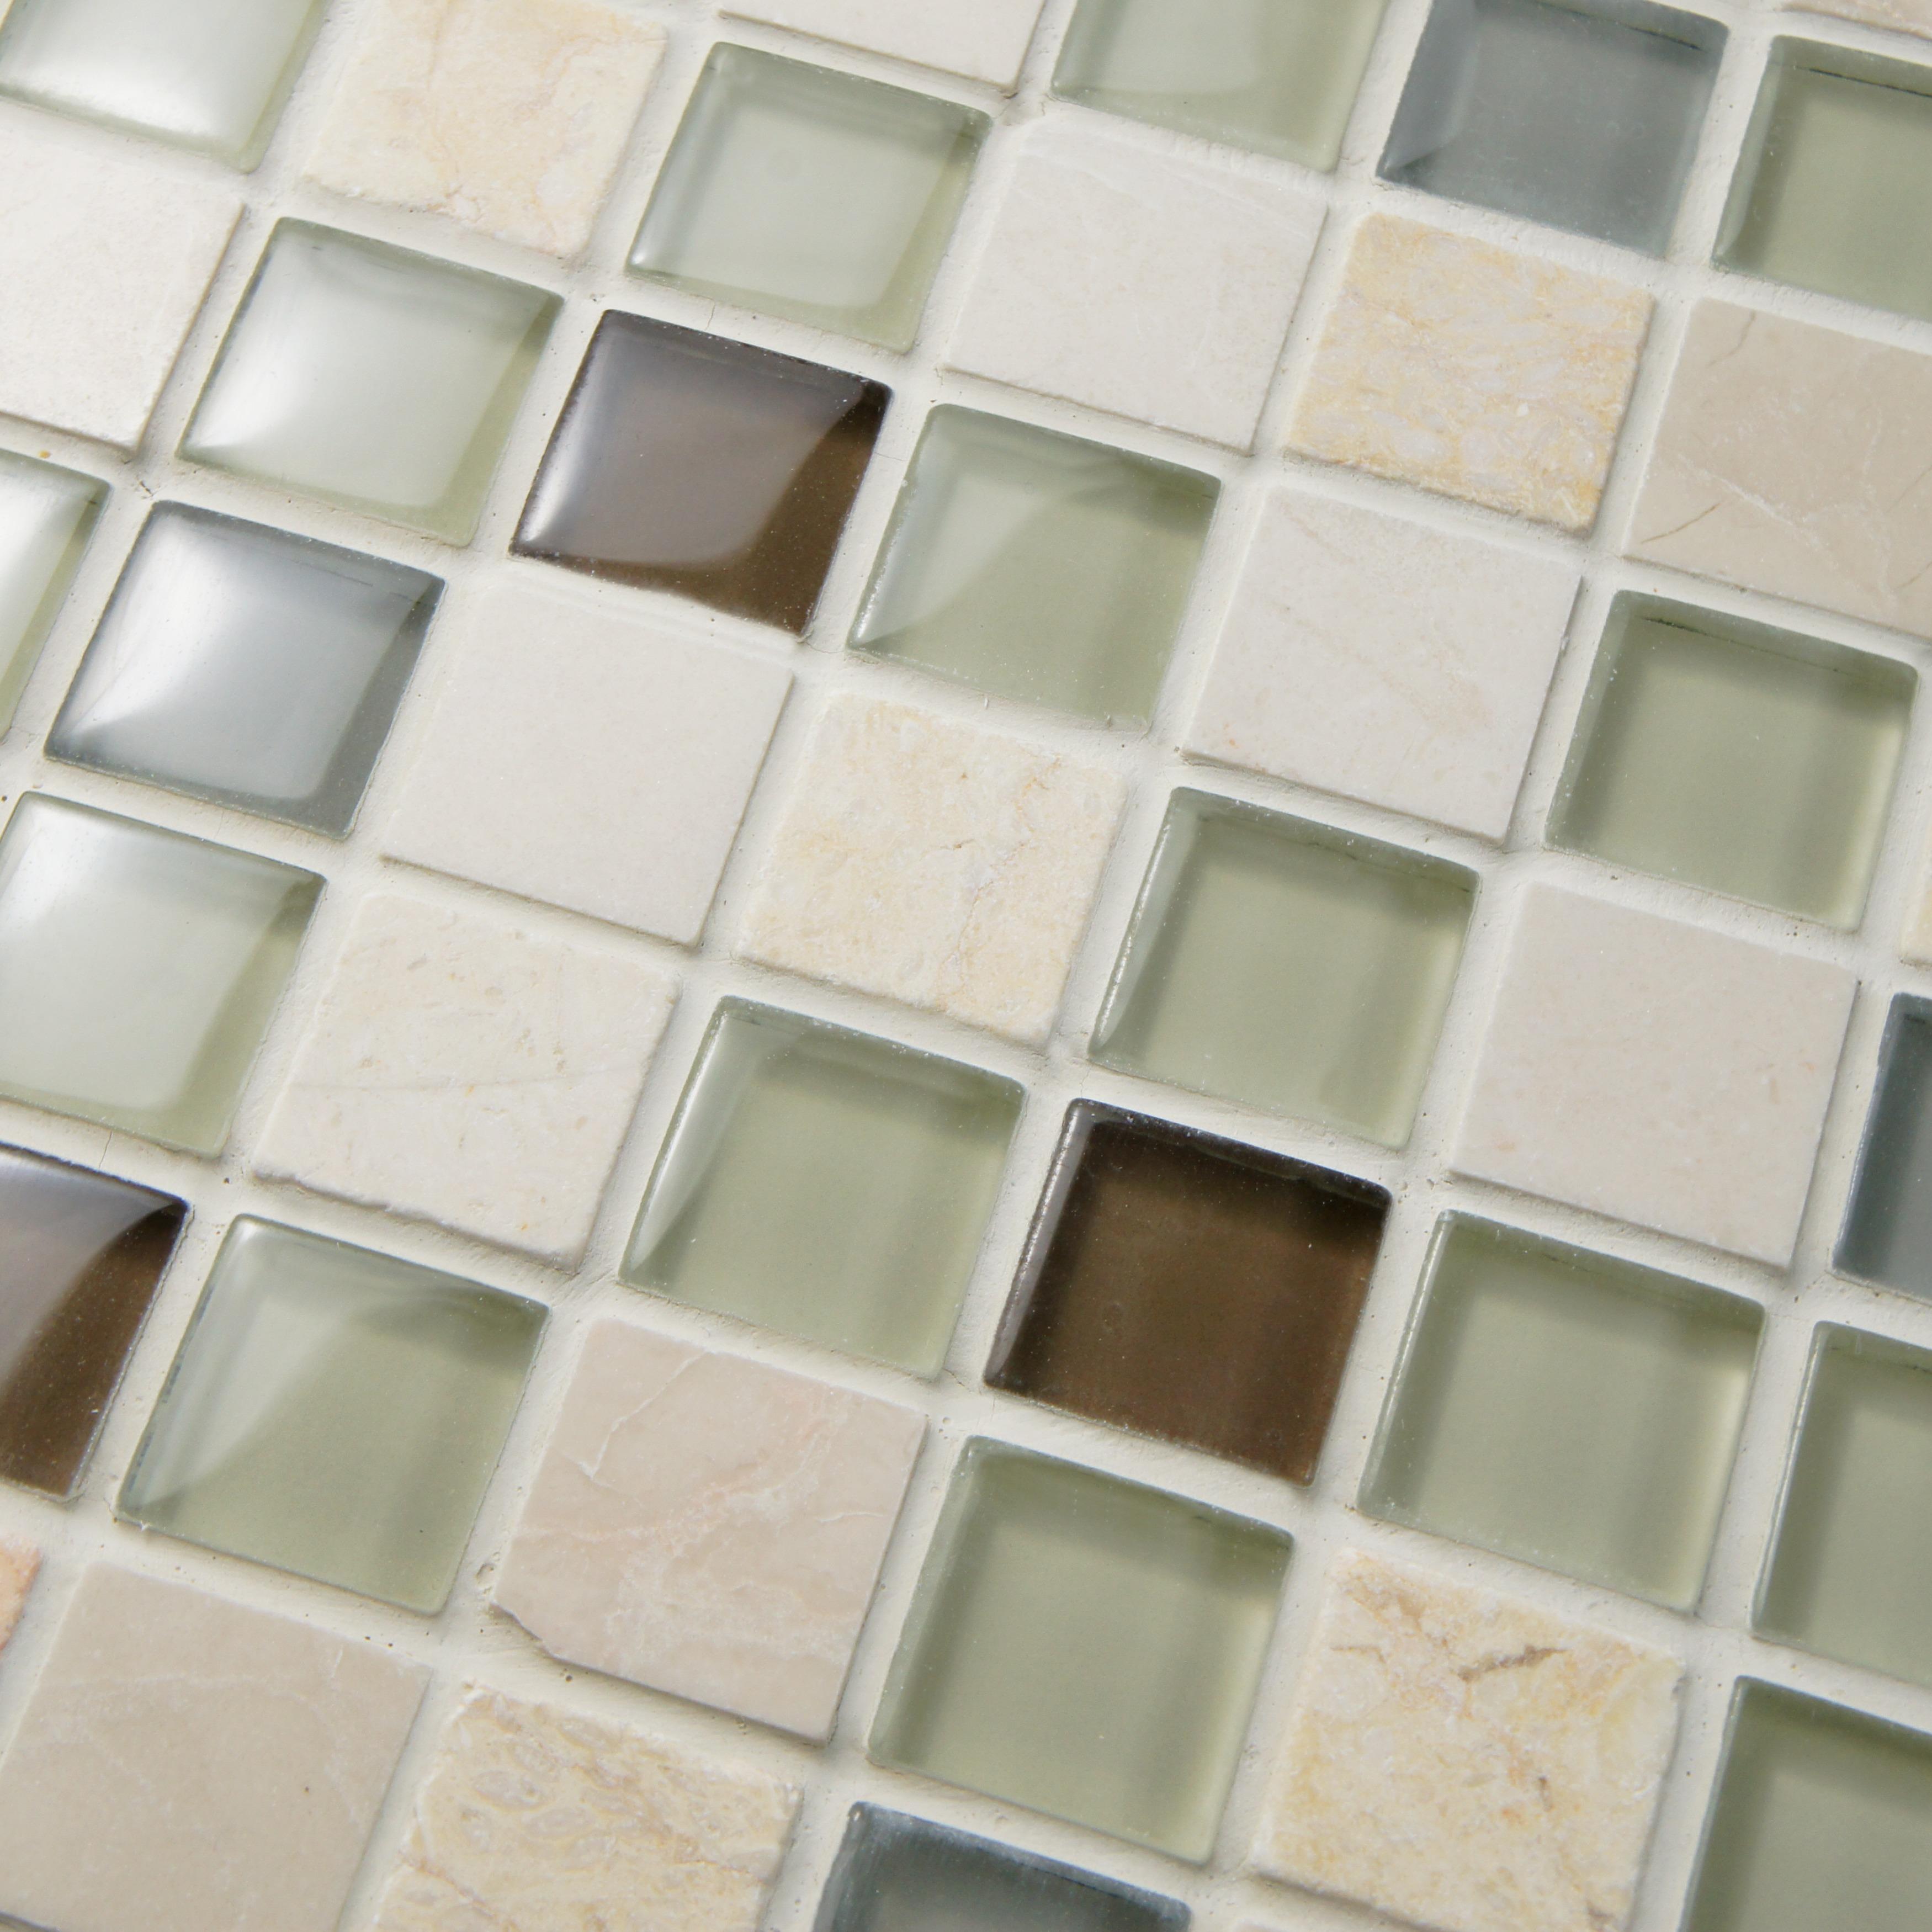 1 Inch Gl Tiles Tile Design Ideas